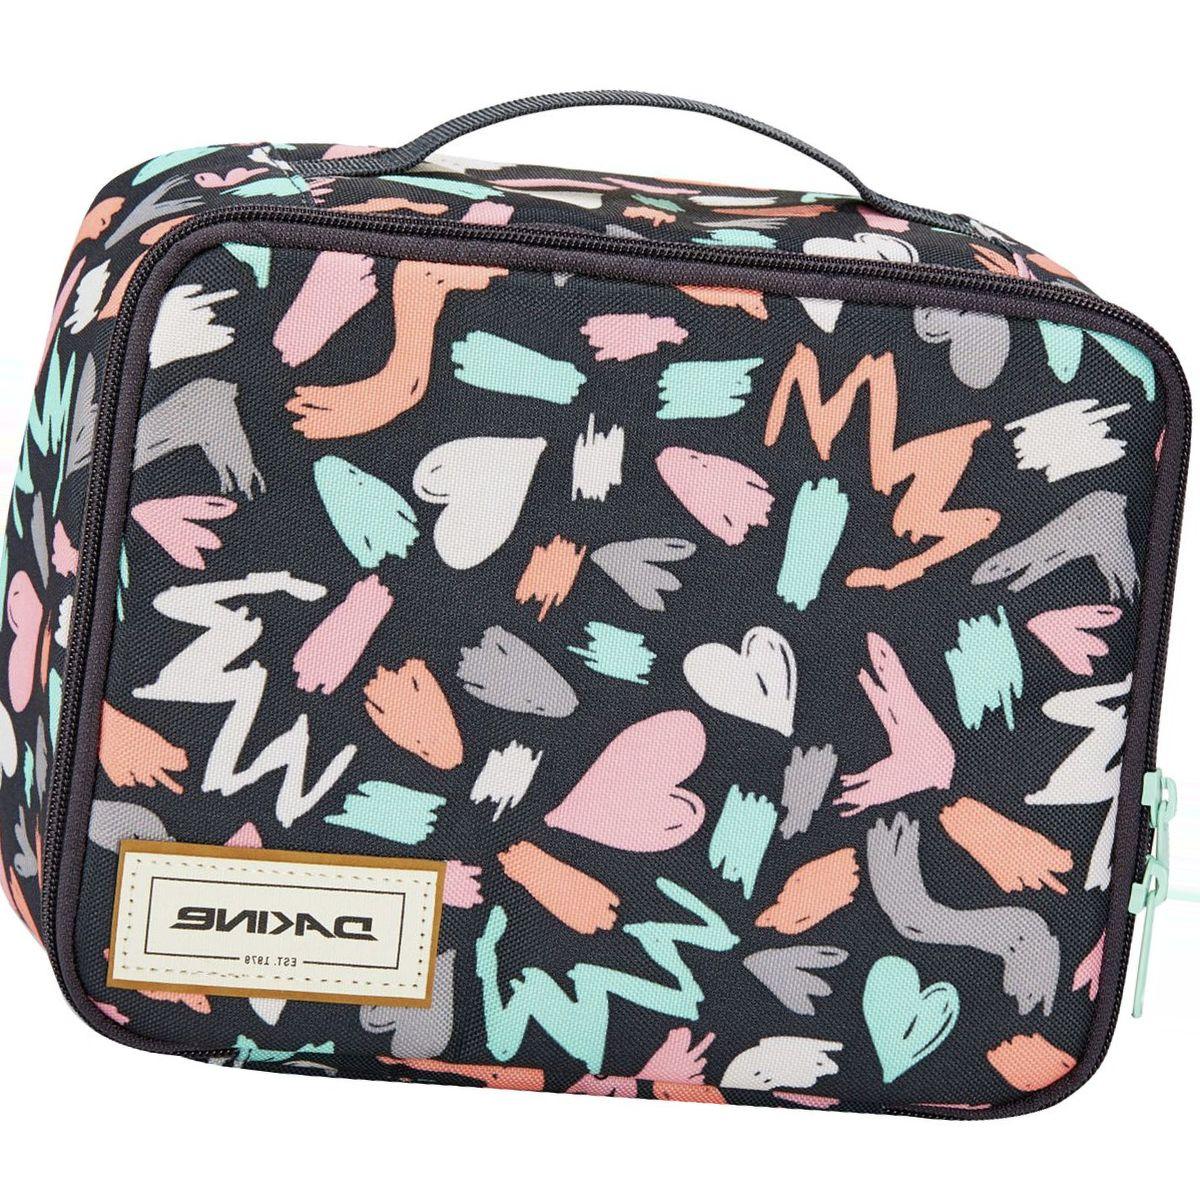 DAKINE 5L Lunch Box - Girls'